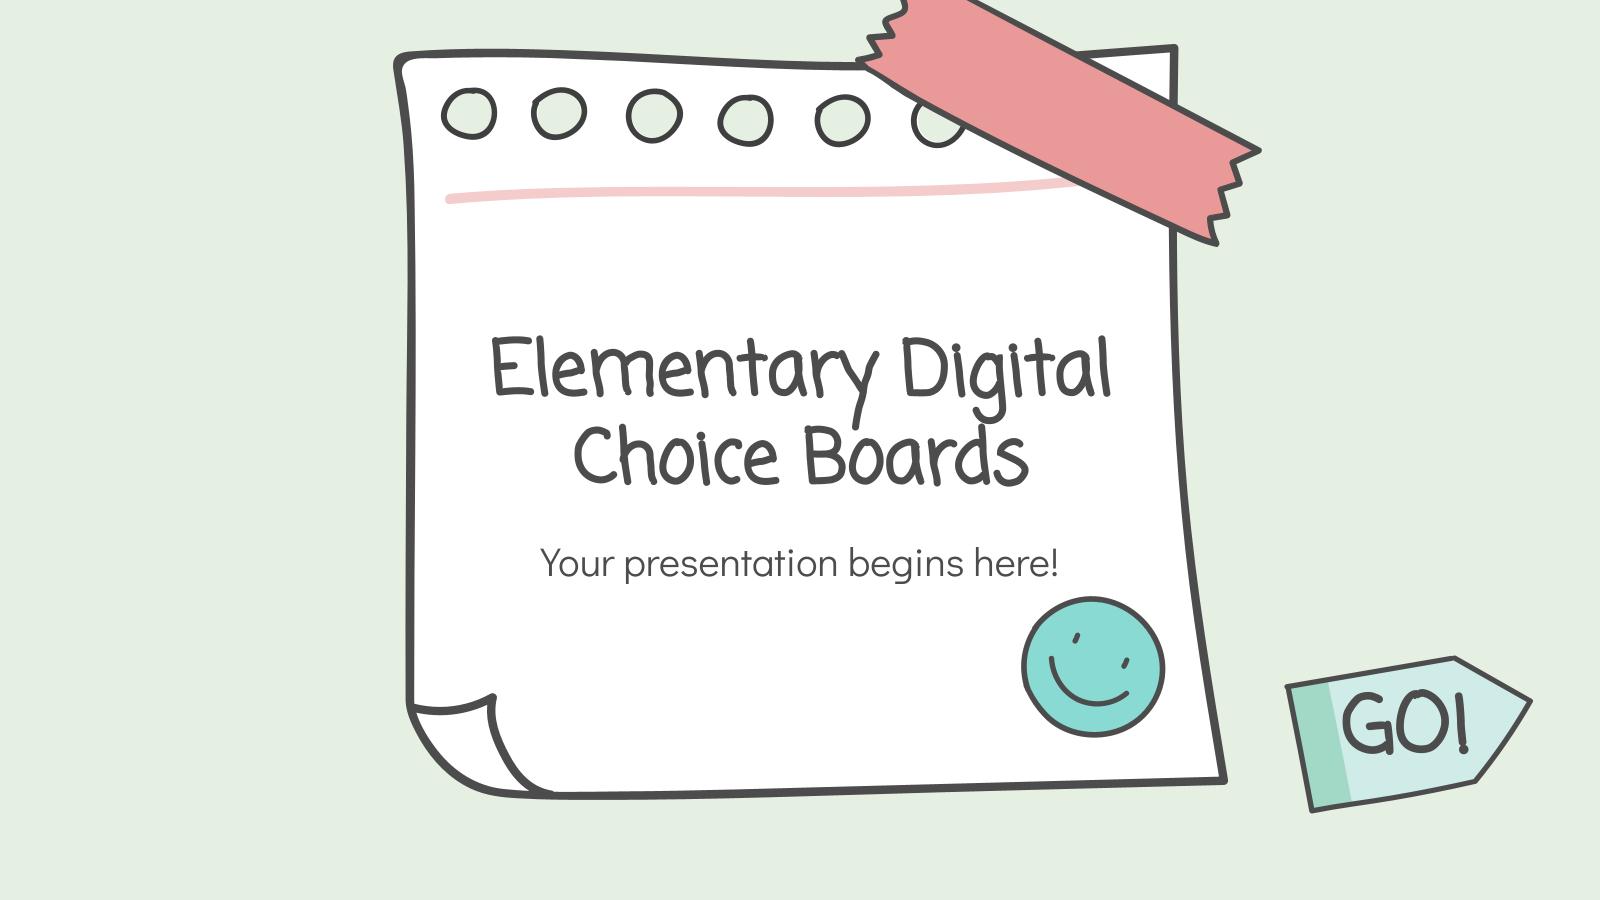 Elementary Digital Choice Boards presentation template